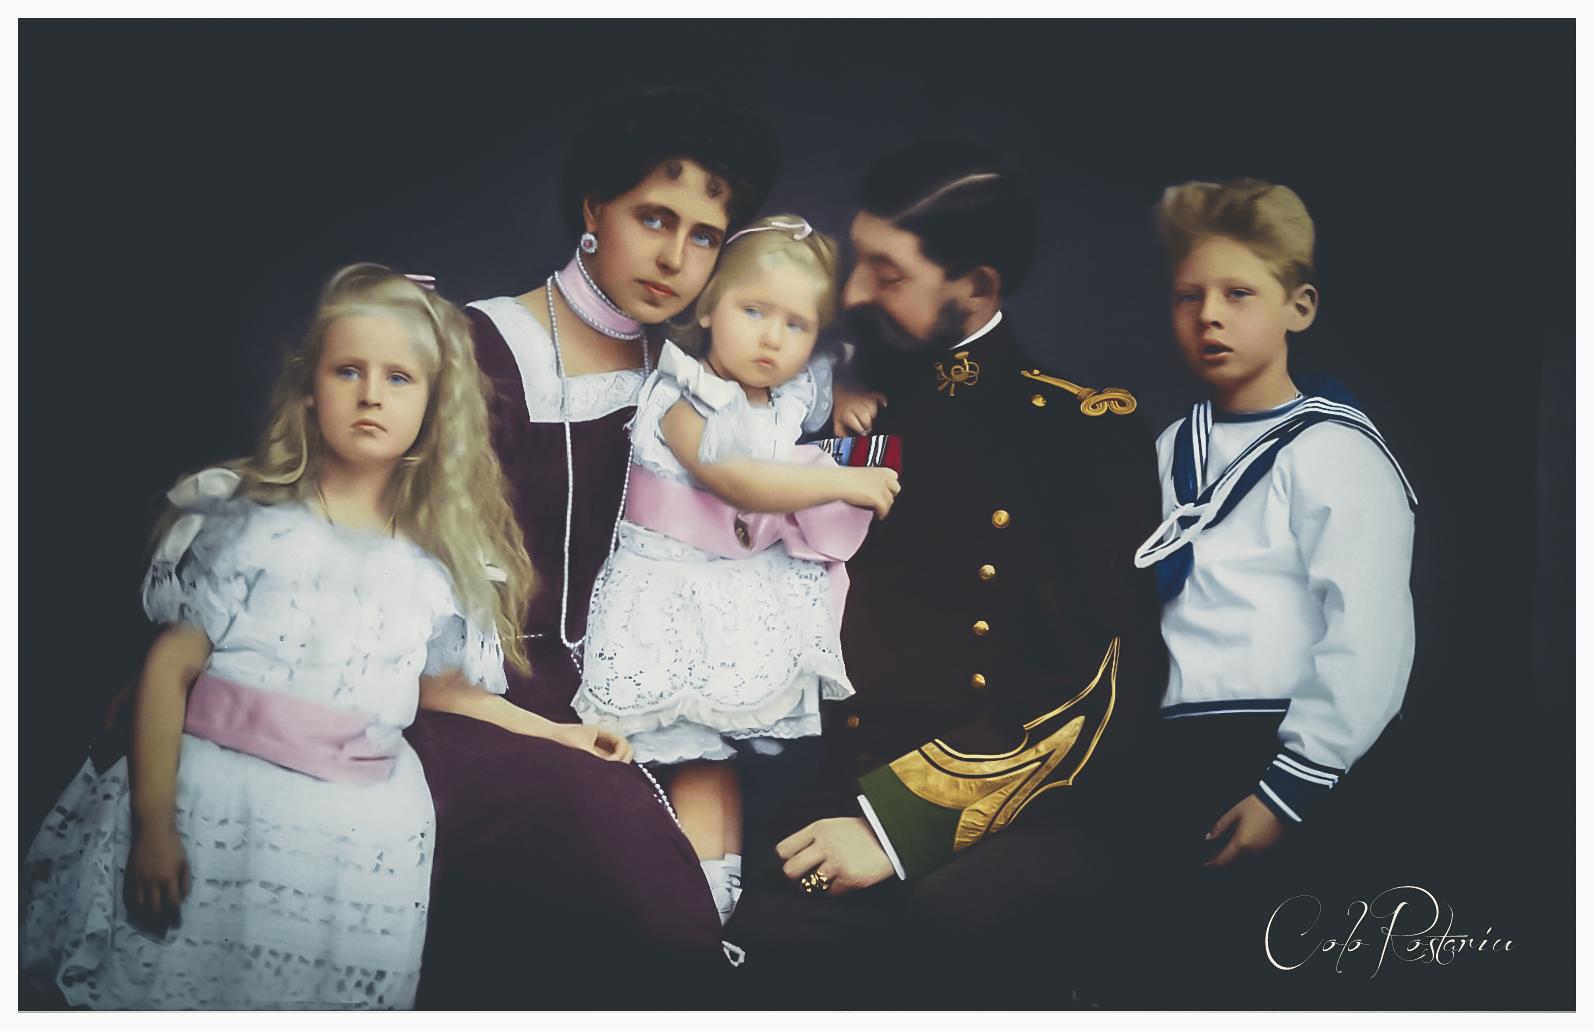 the-romanian-royal-family-casa-regala-rege-regina-queen-king-of-romania-prince-princess-ww1-ww2-world-war-uk-london-new-york.jpg